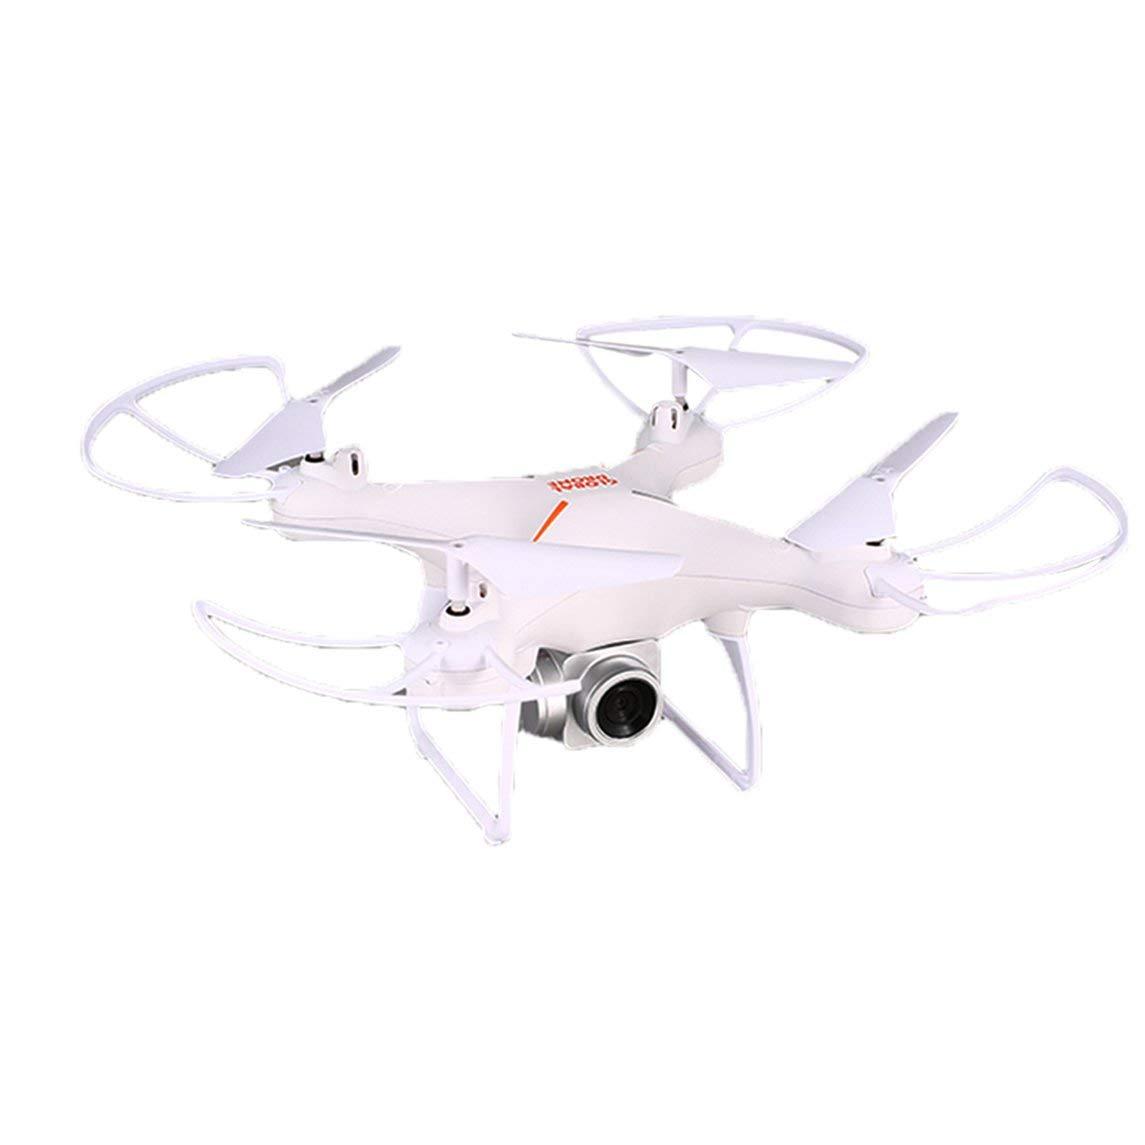 Footprintes GLOBAL DROHNE GW26 Selfie FPV RC 2.4G RC Quadcopter Drohnenflugzeug mit 1080P WiFi-Kamera 20 Minuten Langer Flug